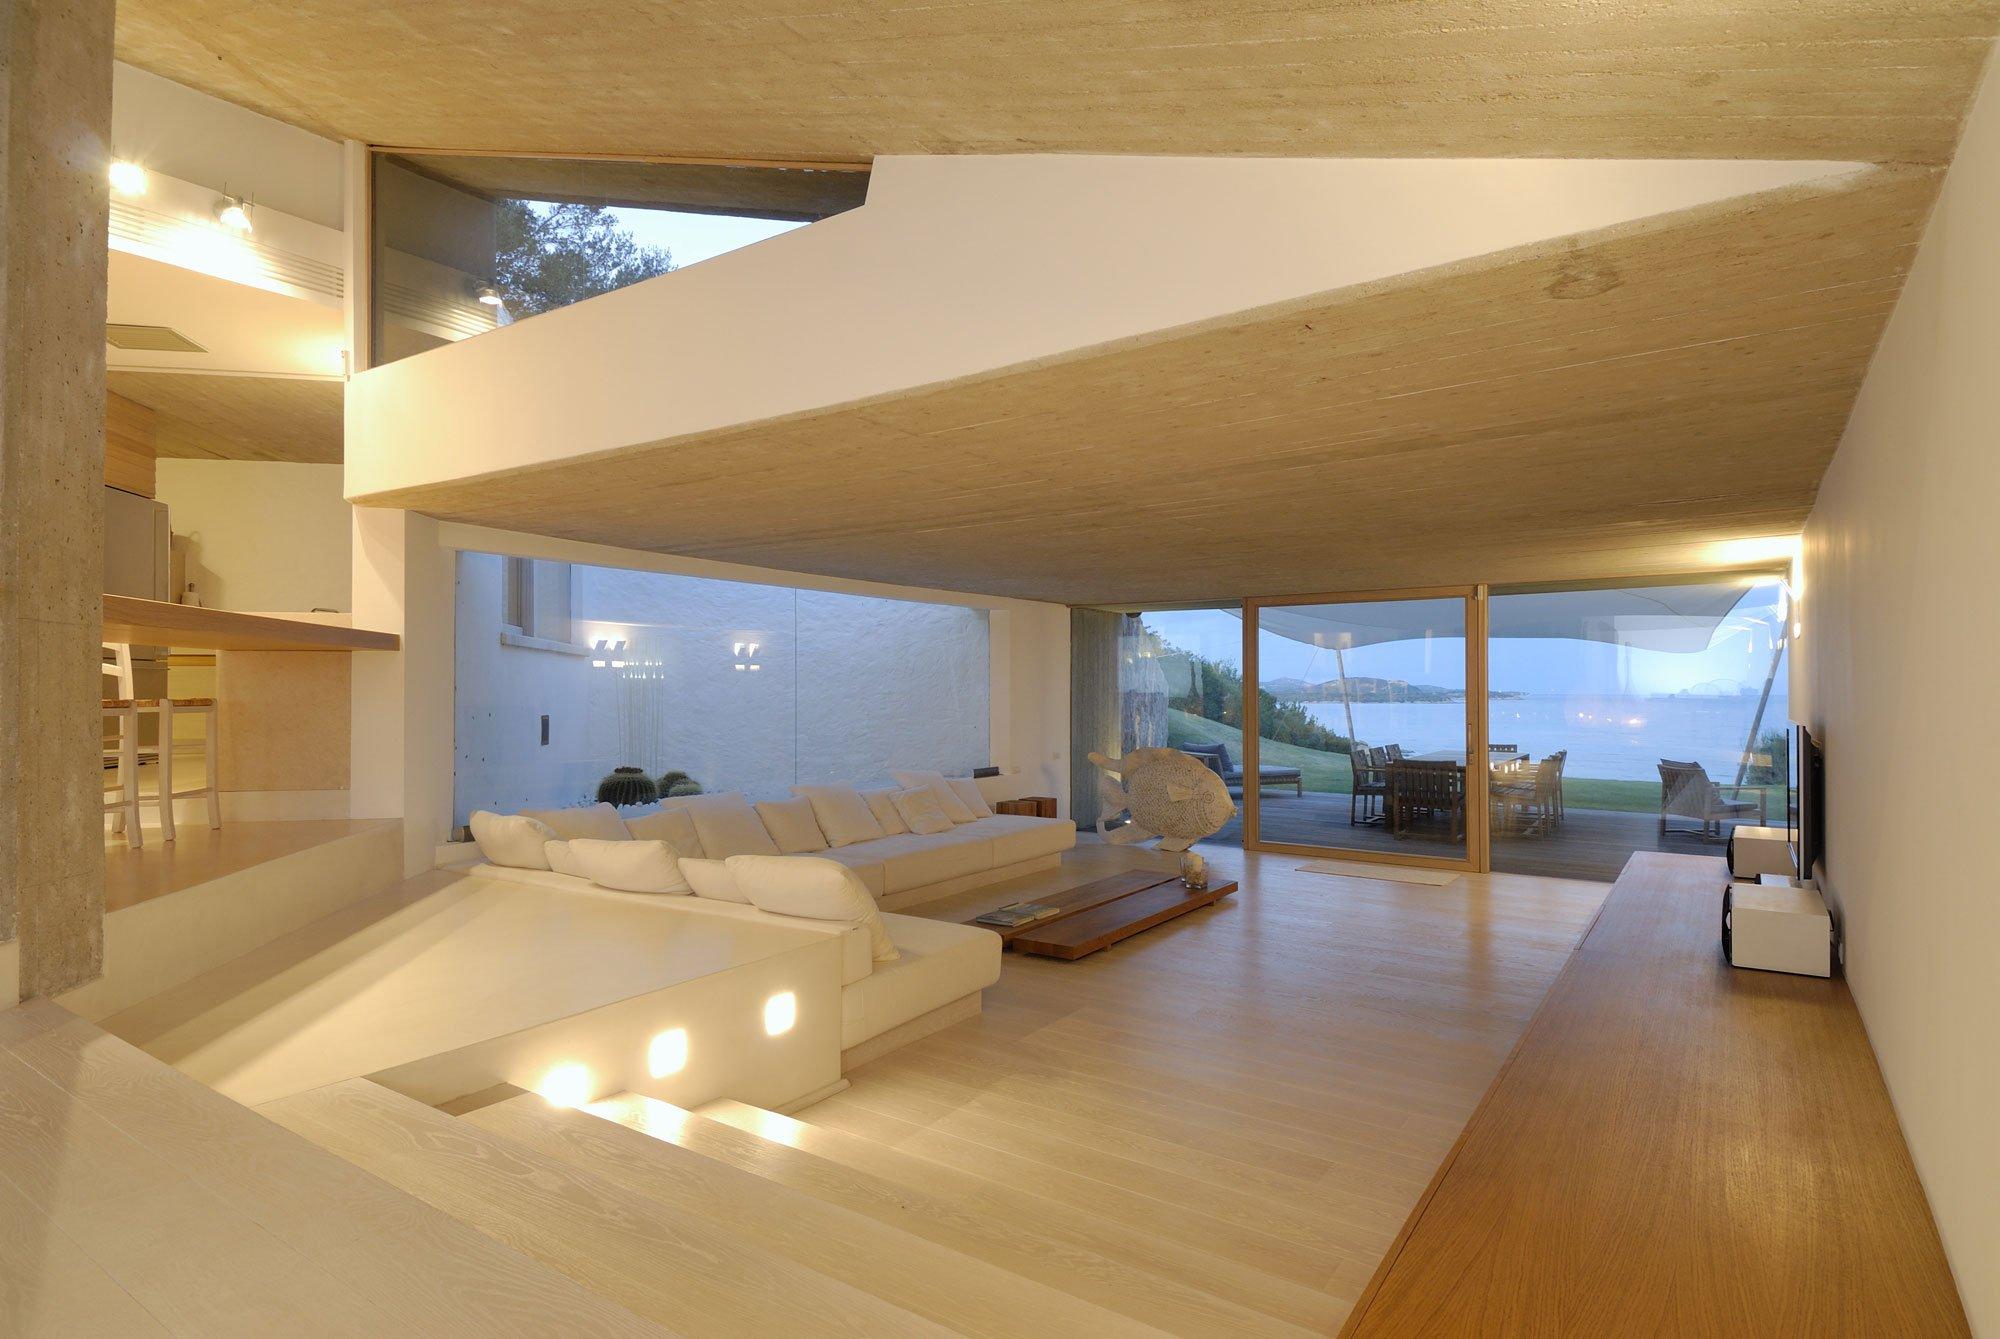 House-in-Sardinia-19